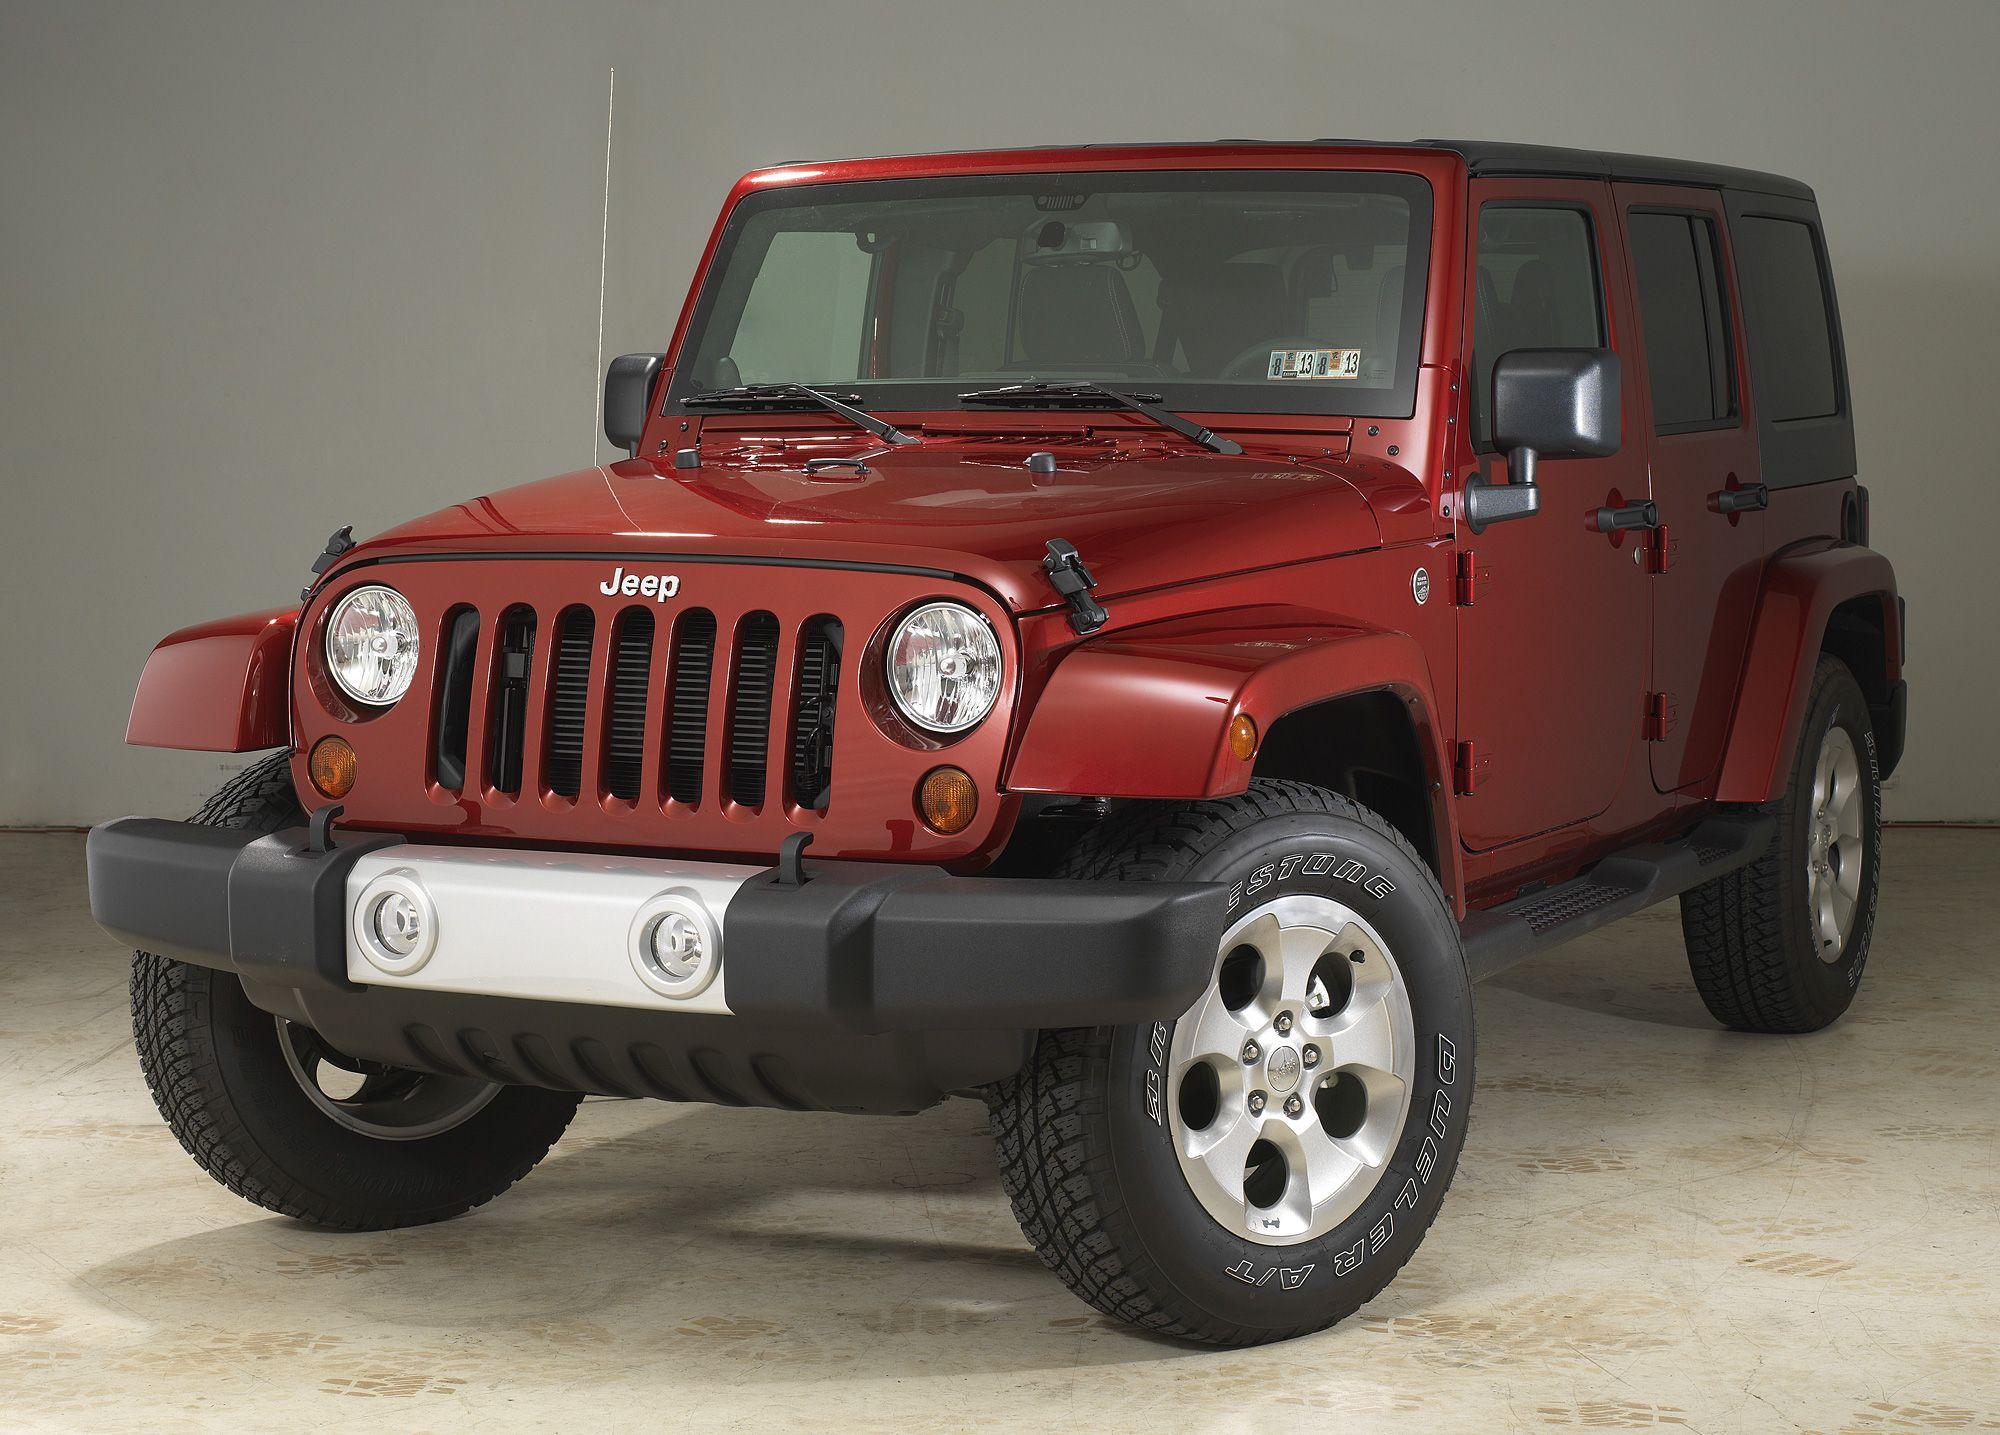 2013 Jeep Sahara 0 60